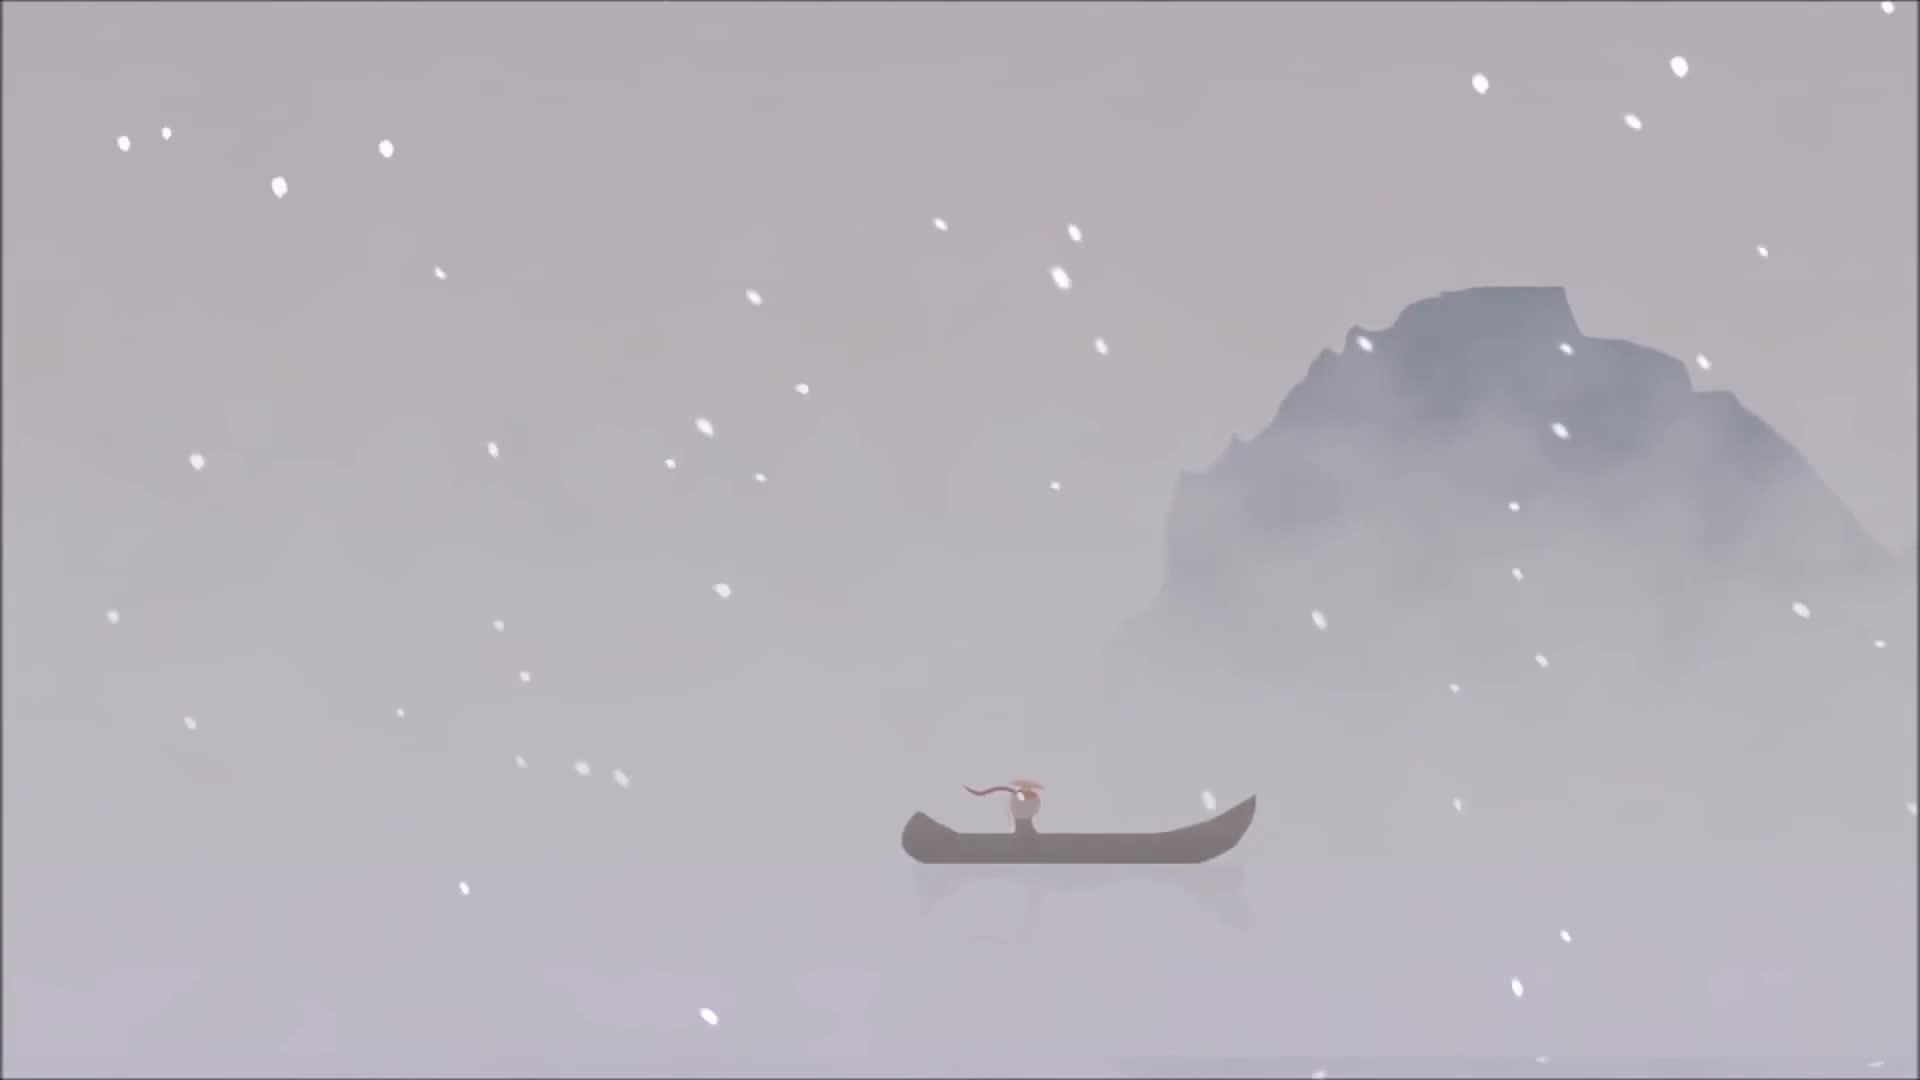 The Bonfire: Forsaken Lands - Game sinh tồn phong cách 2D chính thức cập bến App Store - ảnh 2